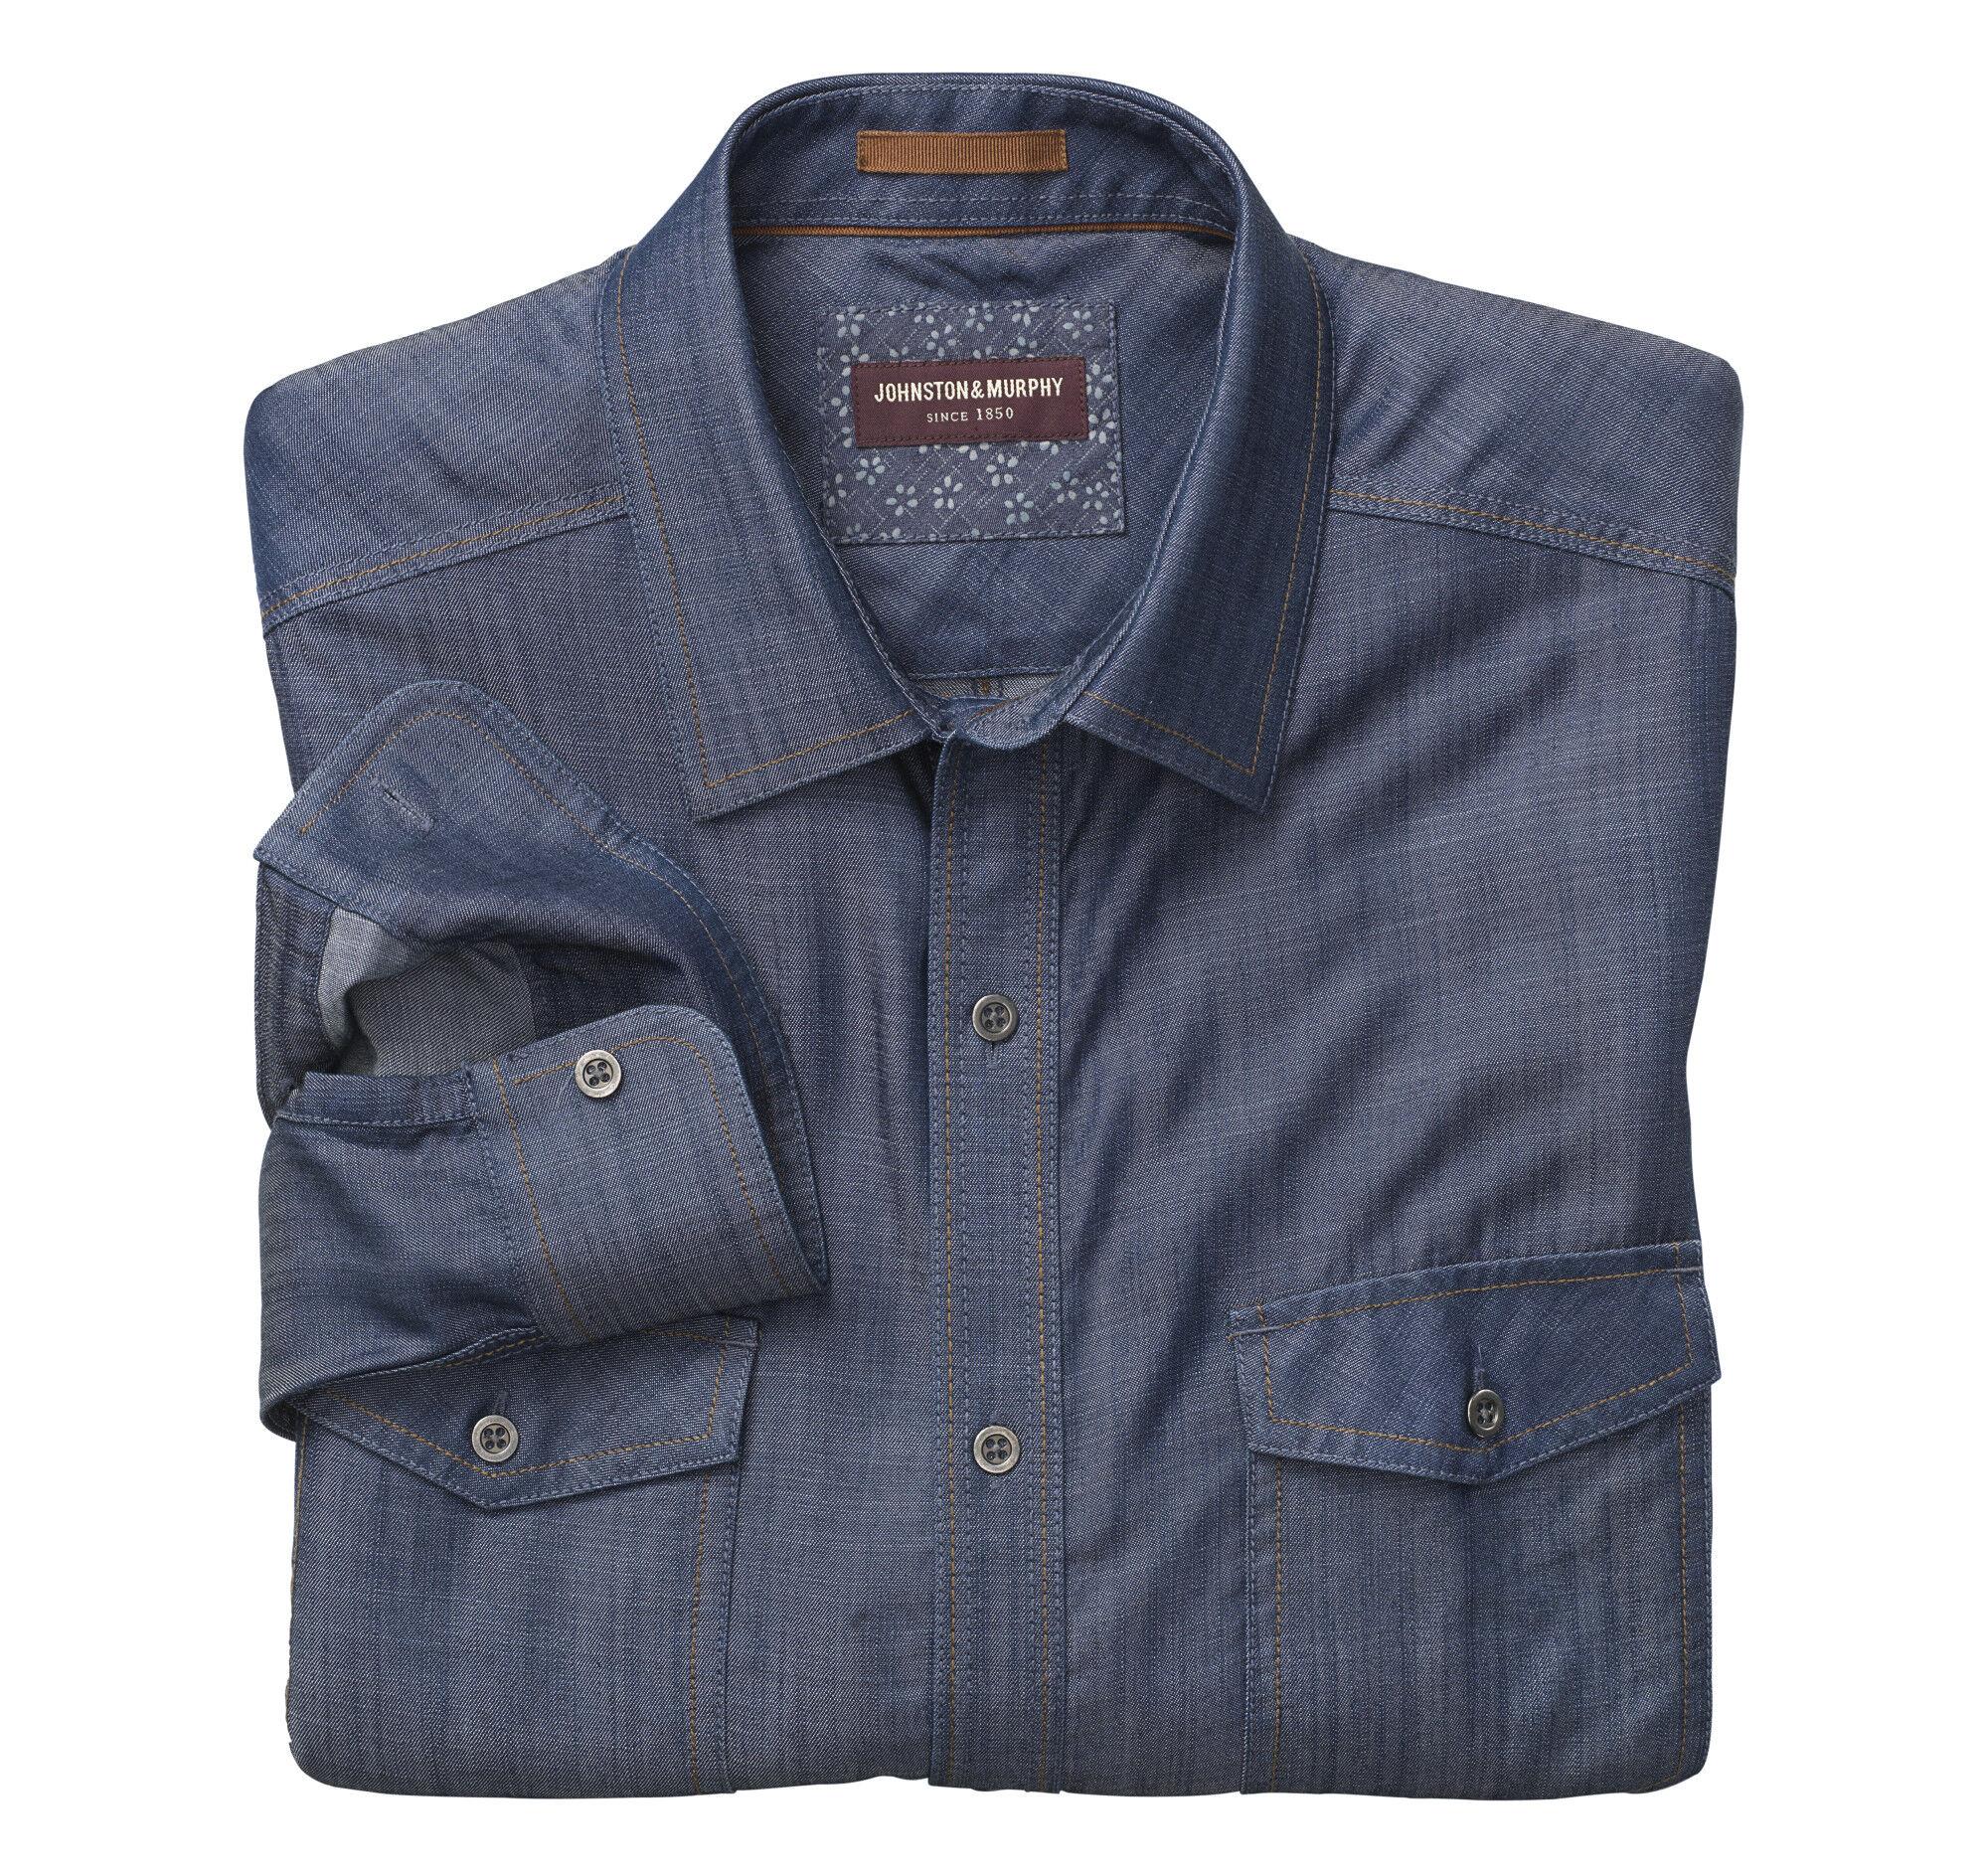 dadd7cff3dd6 Double-Pocket Denim Shirt | Johnston & Murphy